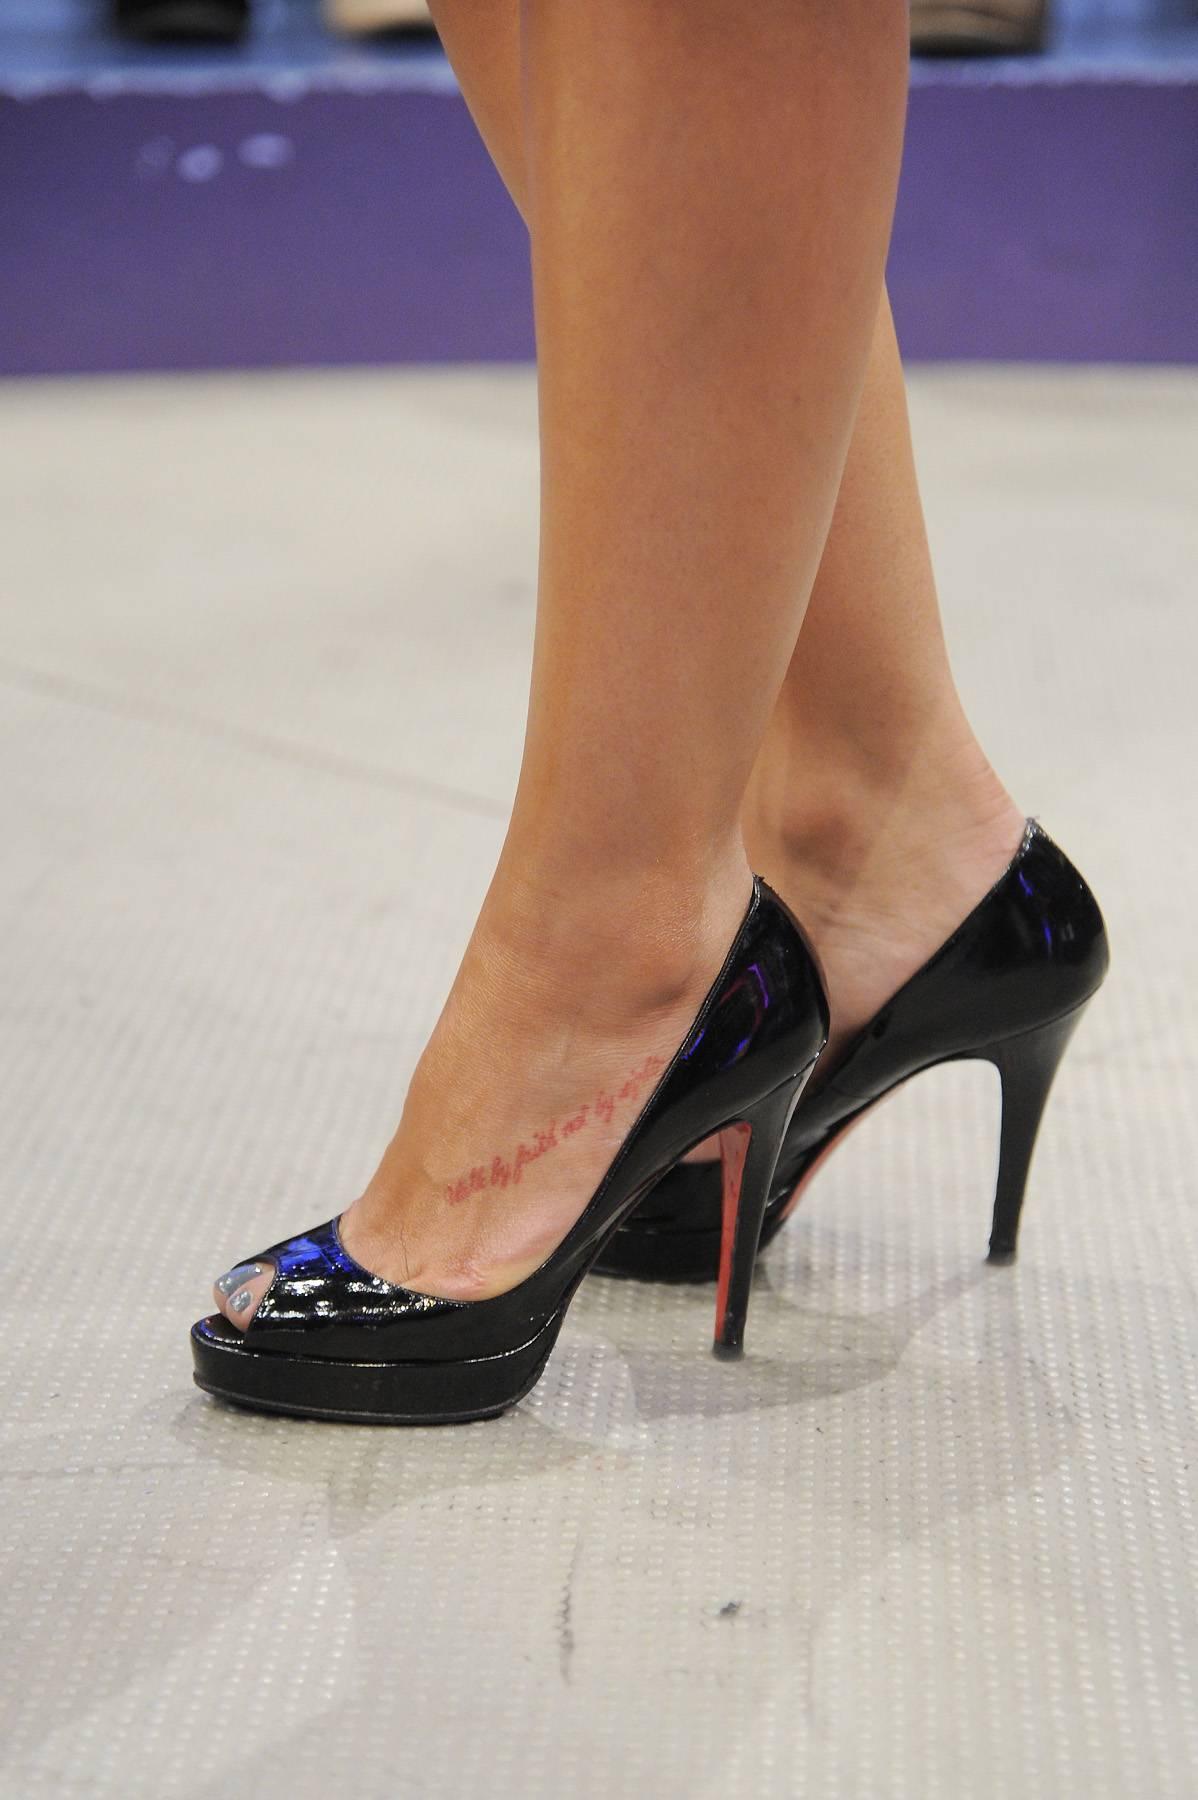 Shoes for Days - Rocsi Diaz at 106 & Park, April 10, 2012.(Photo: John Ricard/BET)